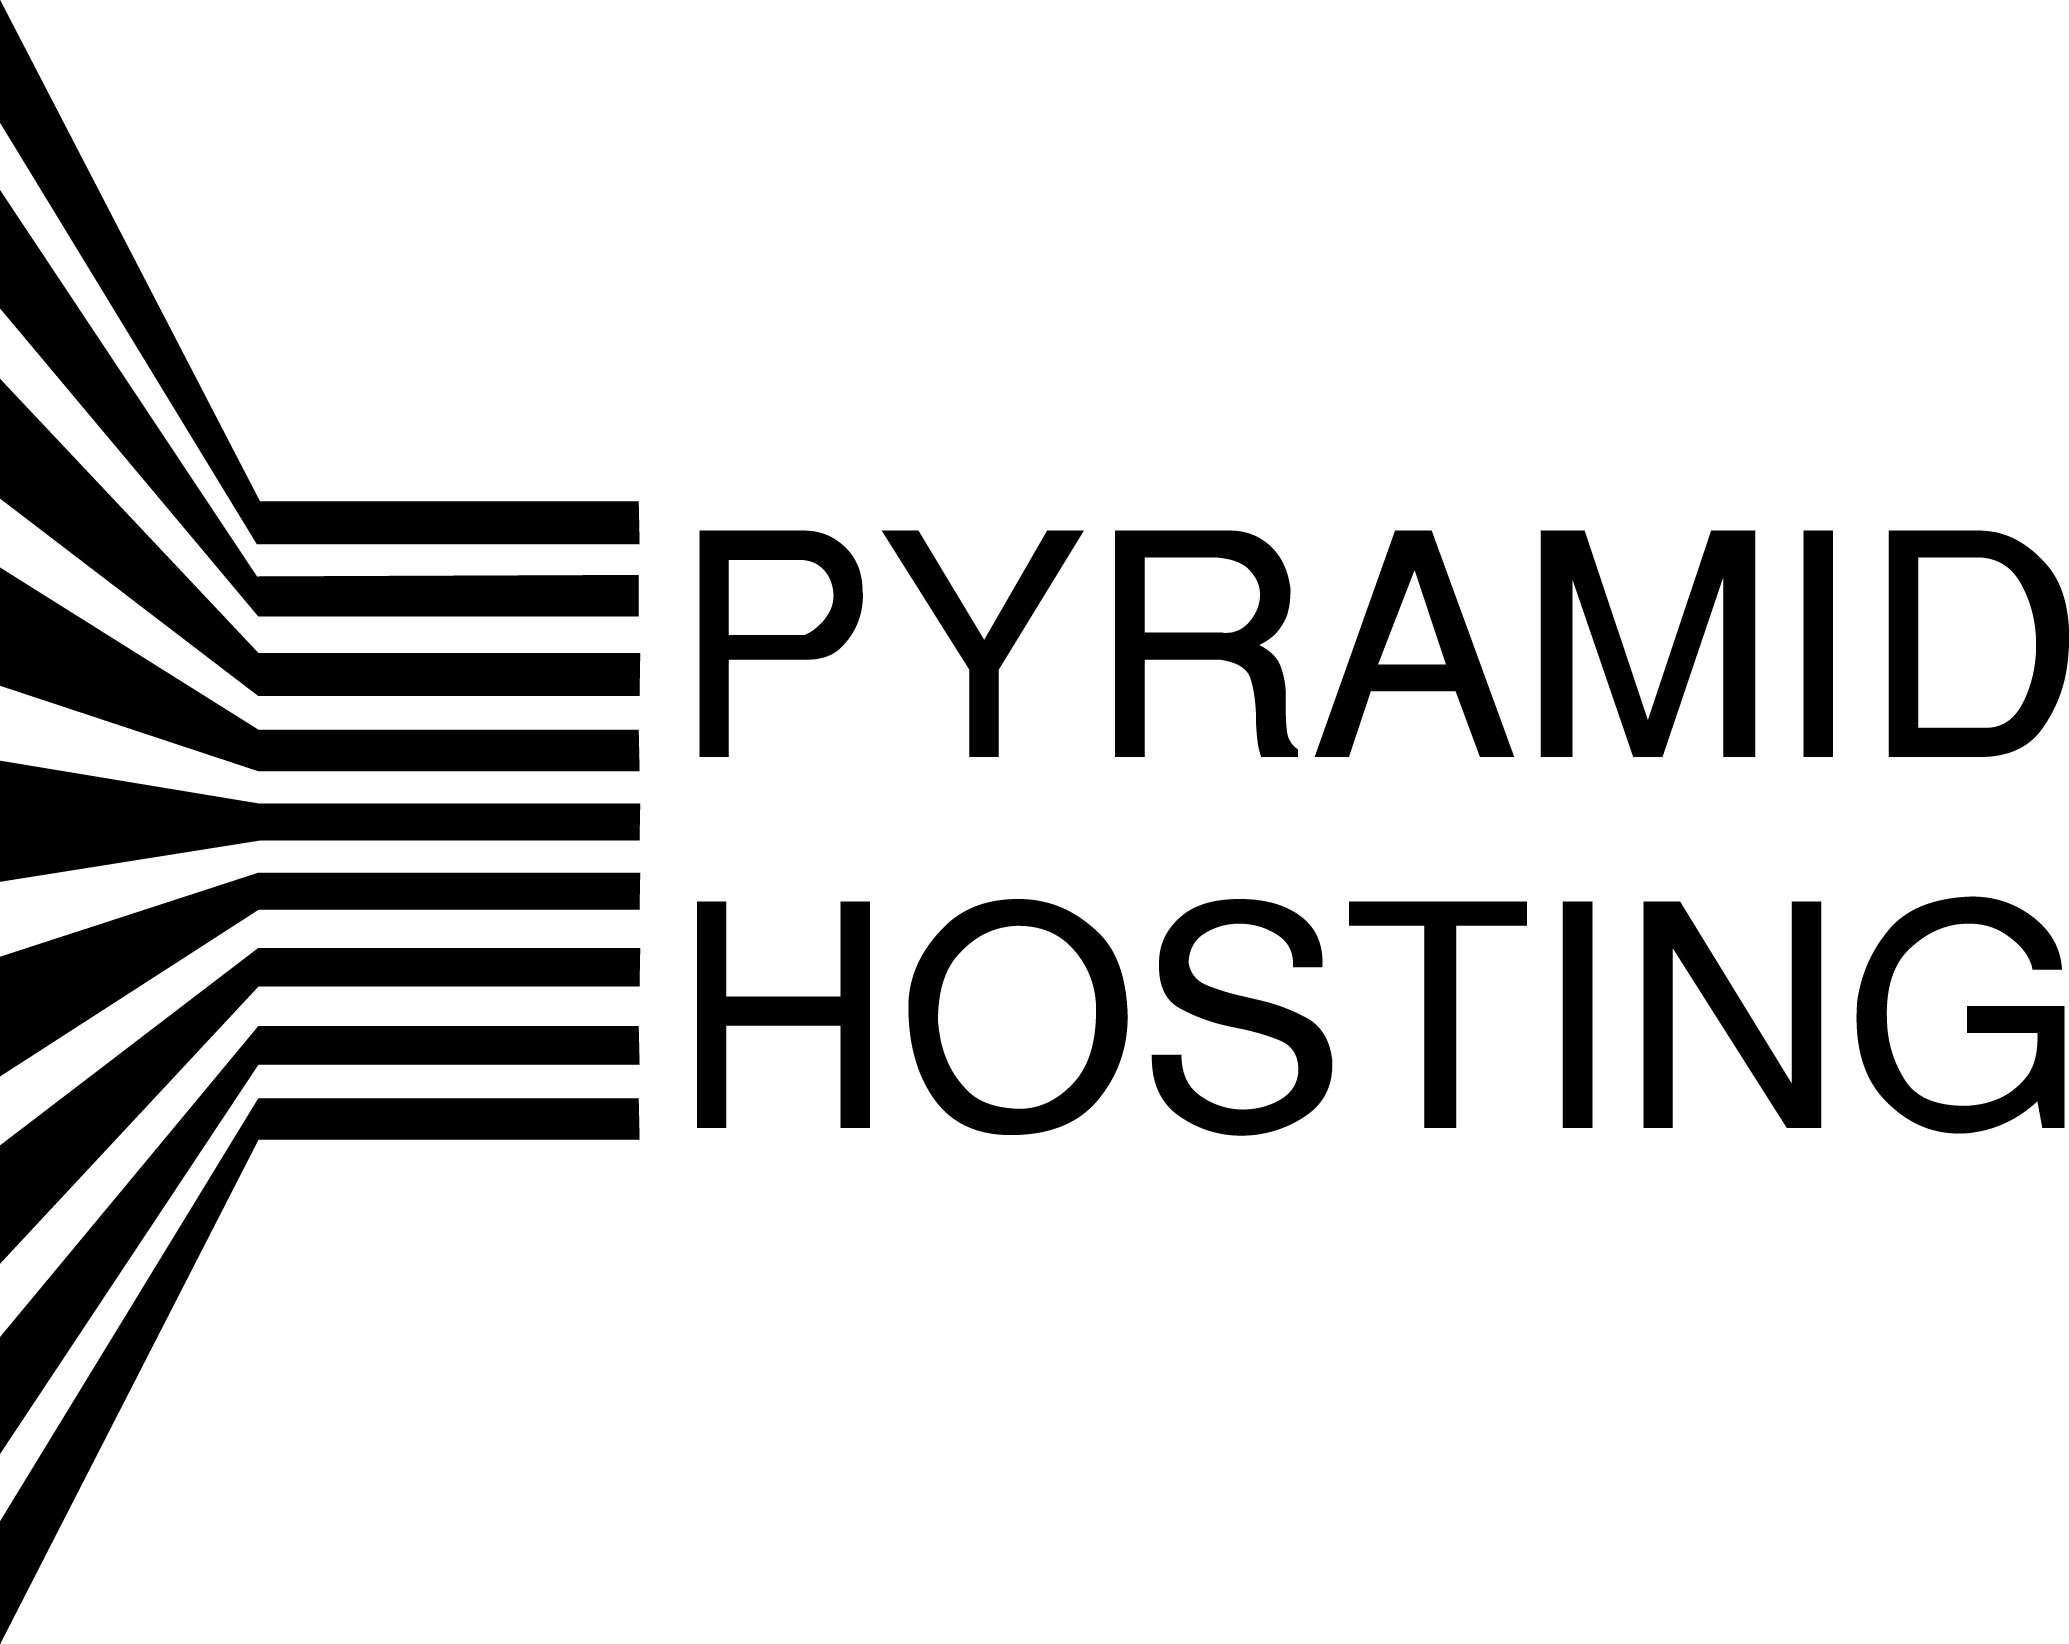 Pyramid Hosting